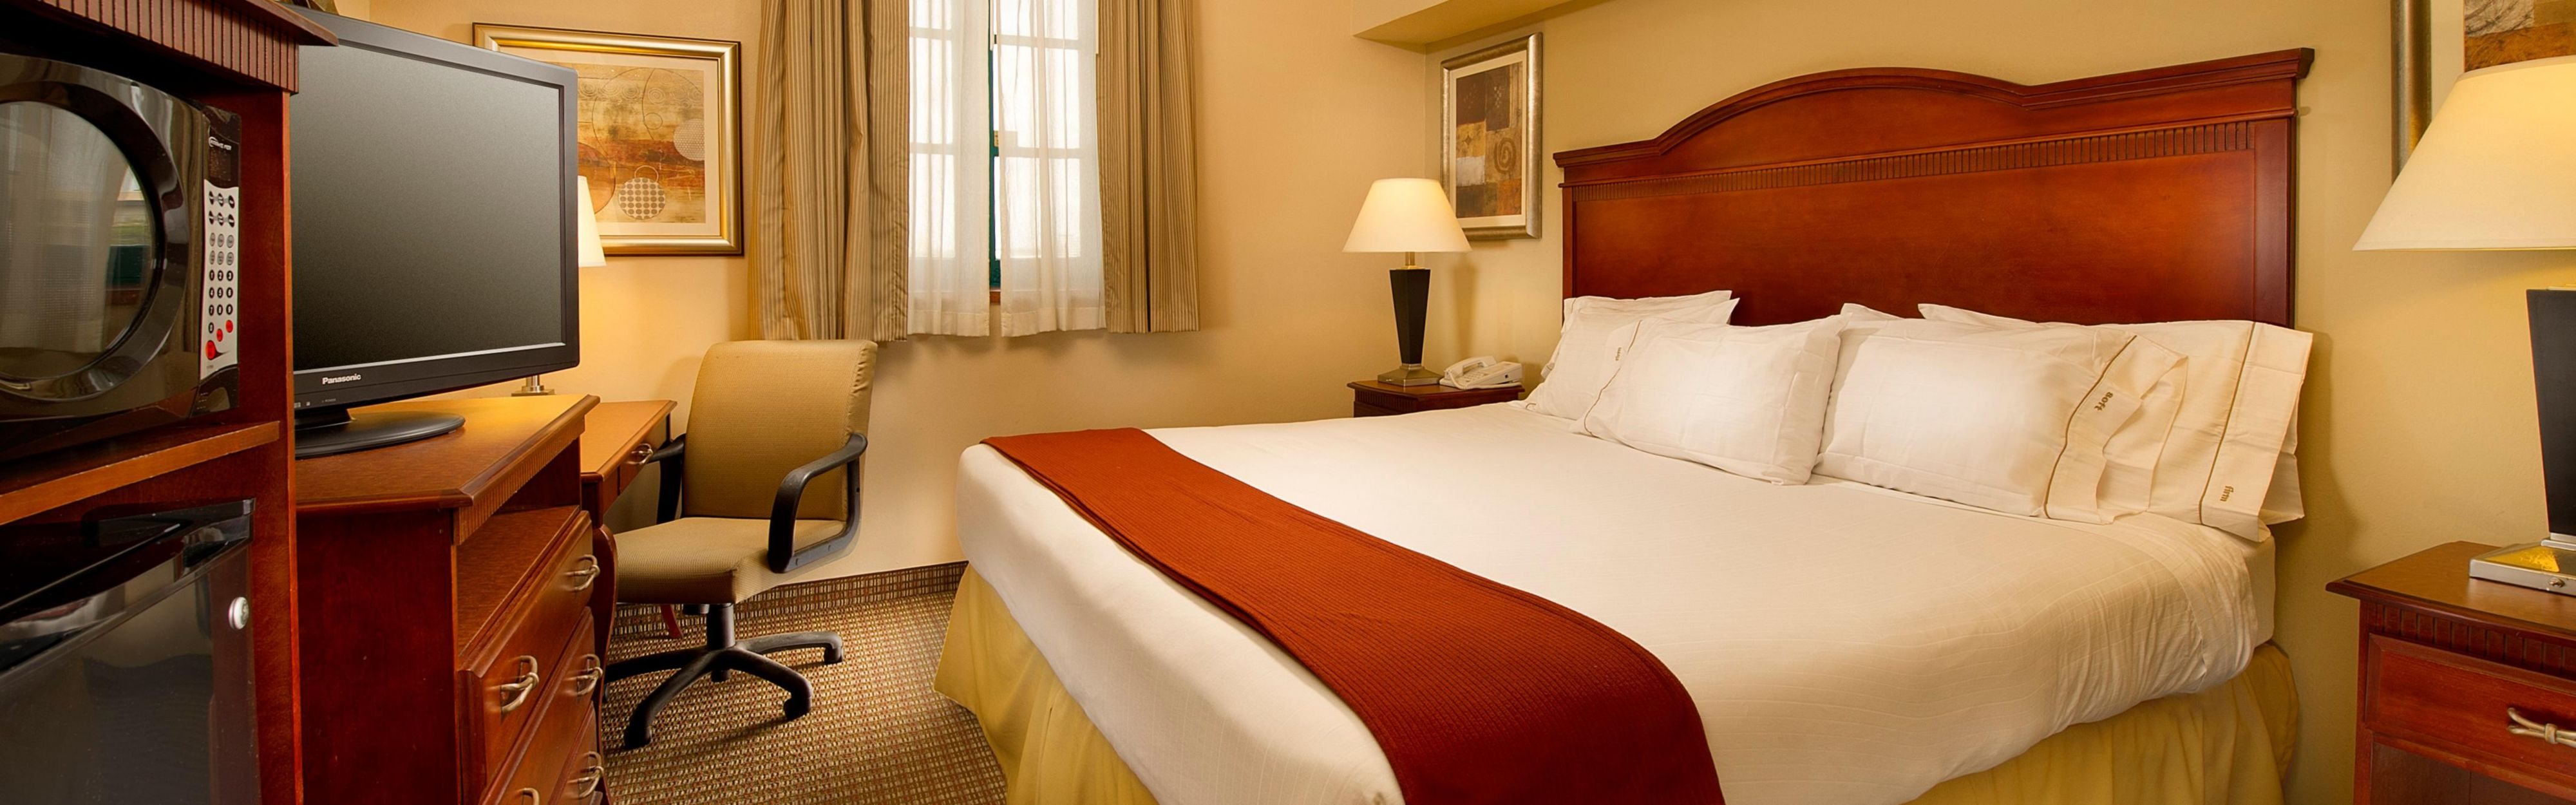 Holiday Inn Express San Antonio N-Riverwalk Area image 1